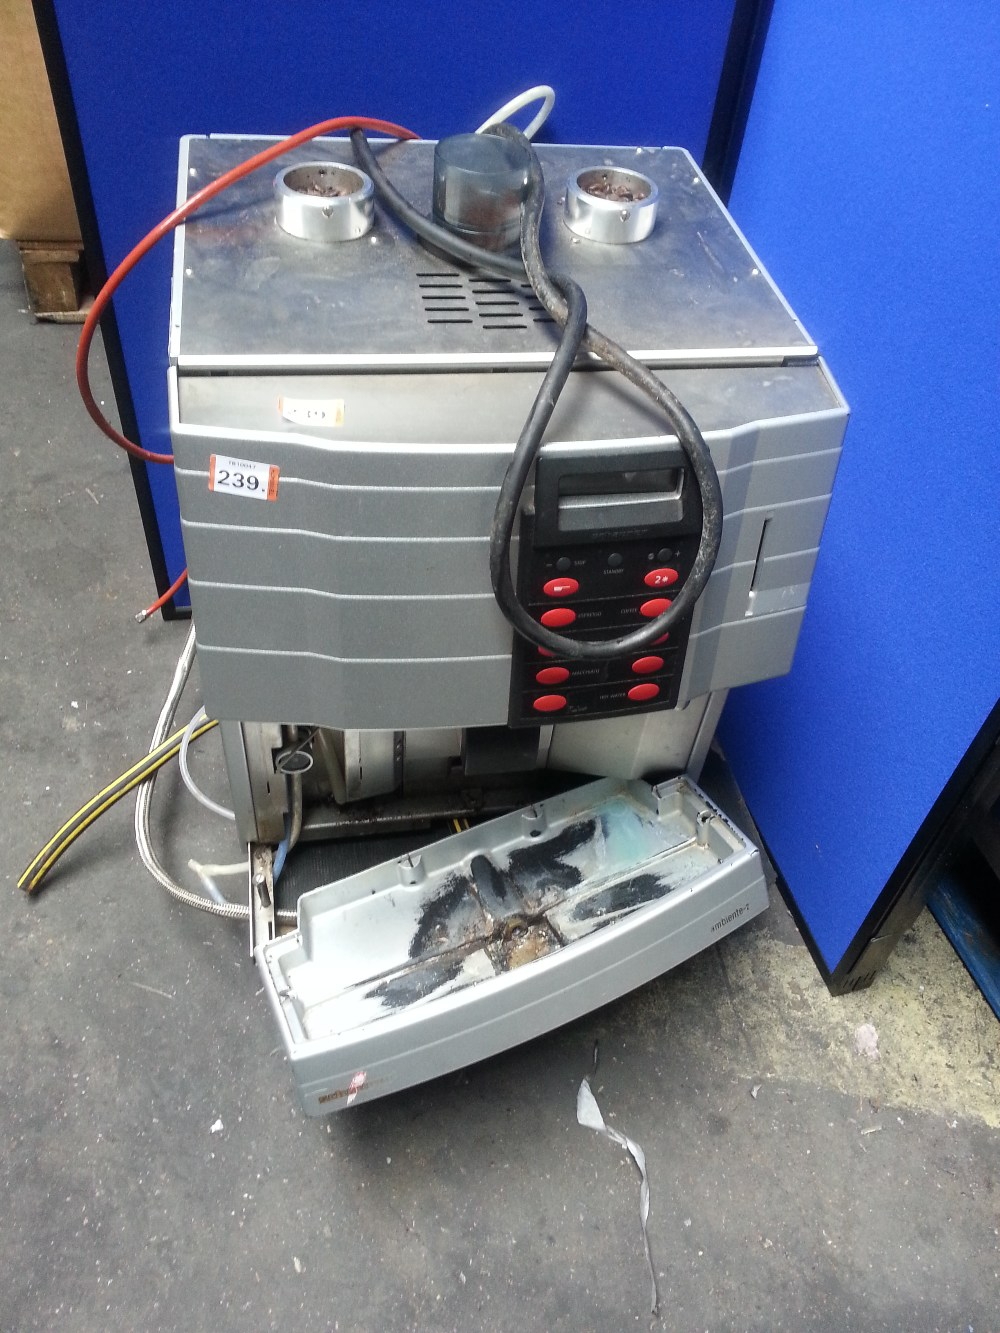 Wiring Diagram 240v 3 Prong Plug Whirlpool Washing Machine Wiring